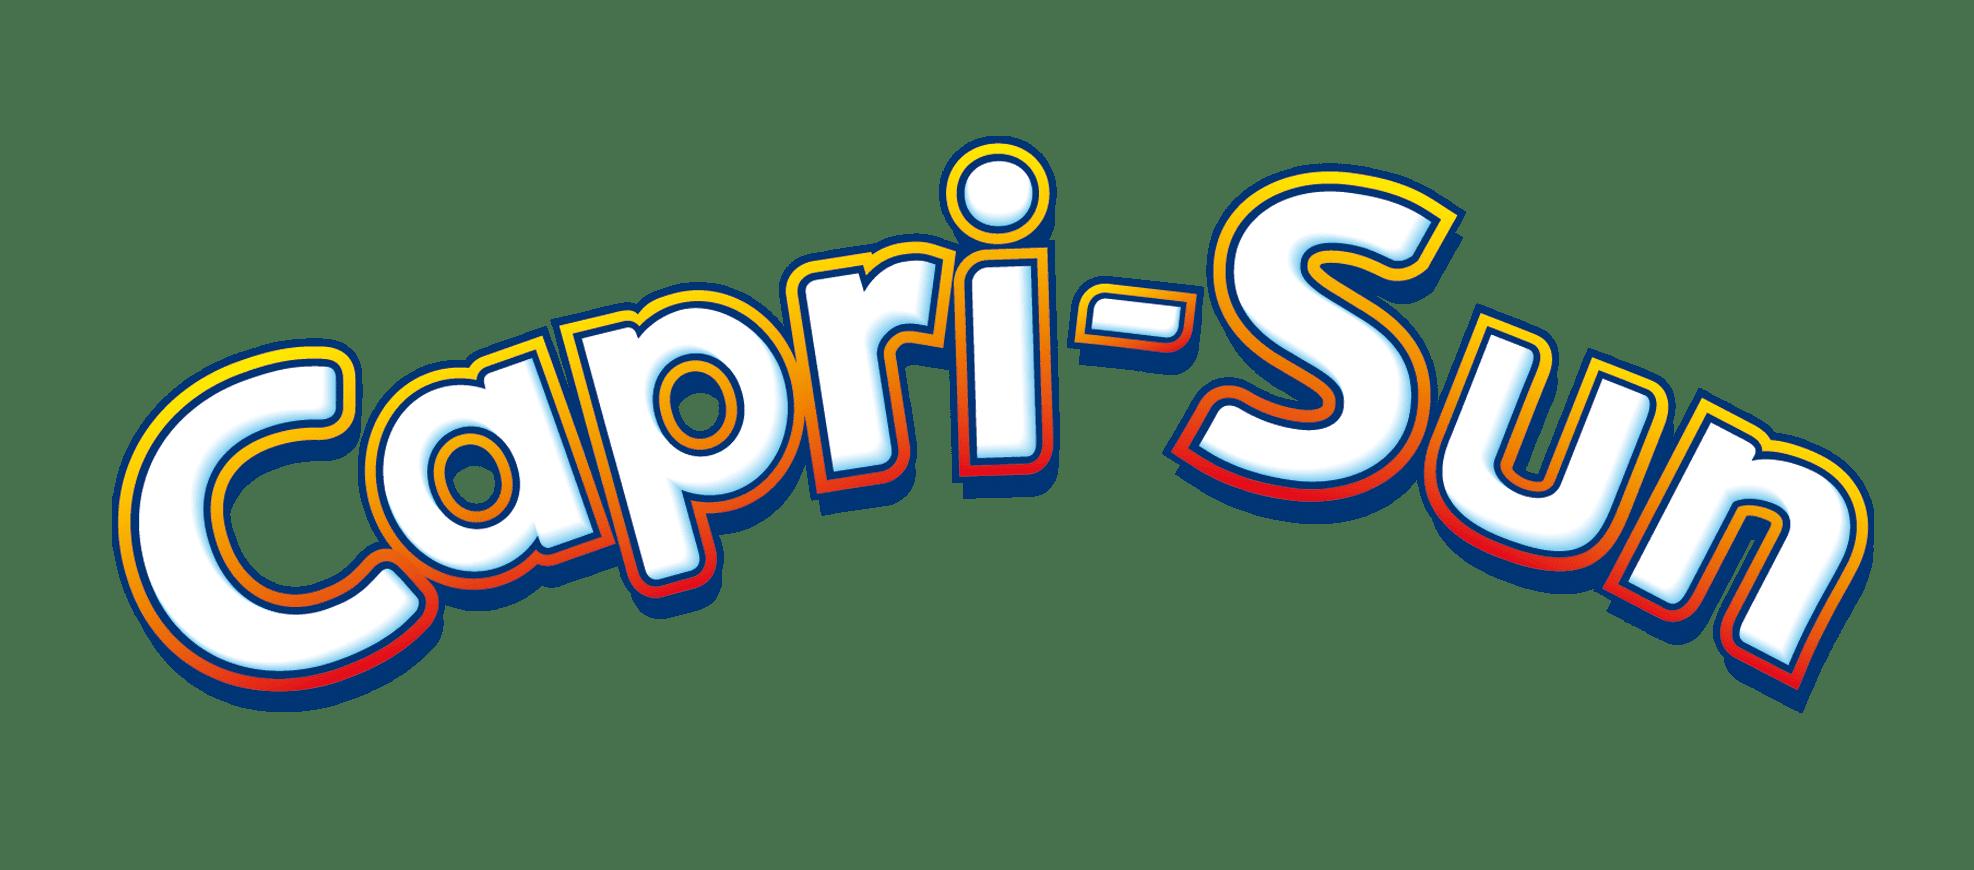 Capri-Sun logo